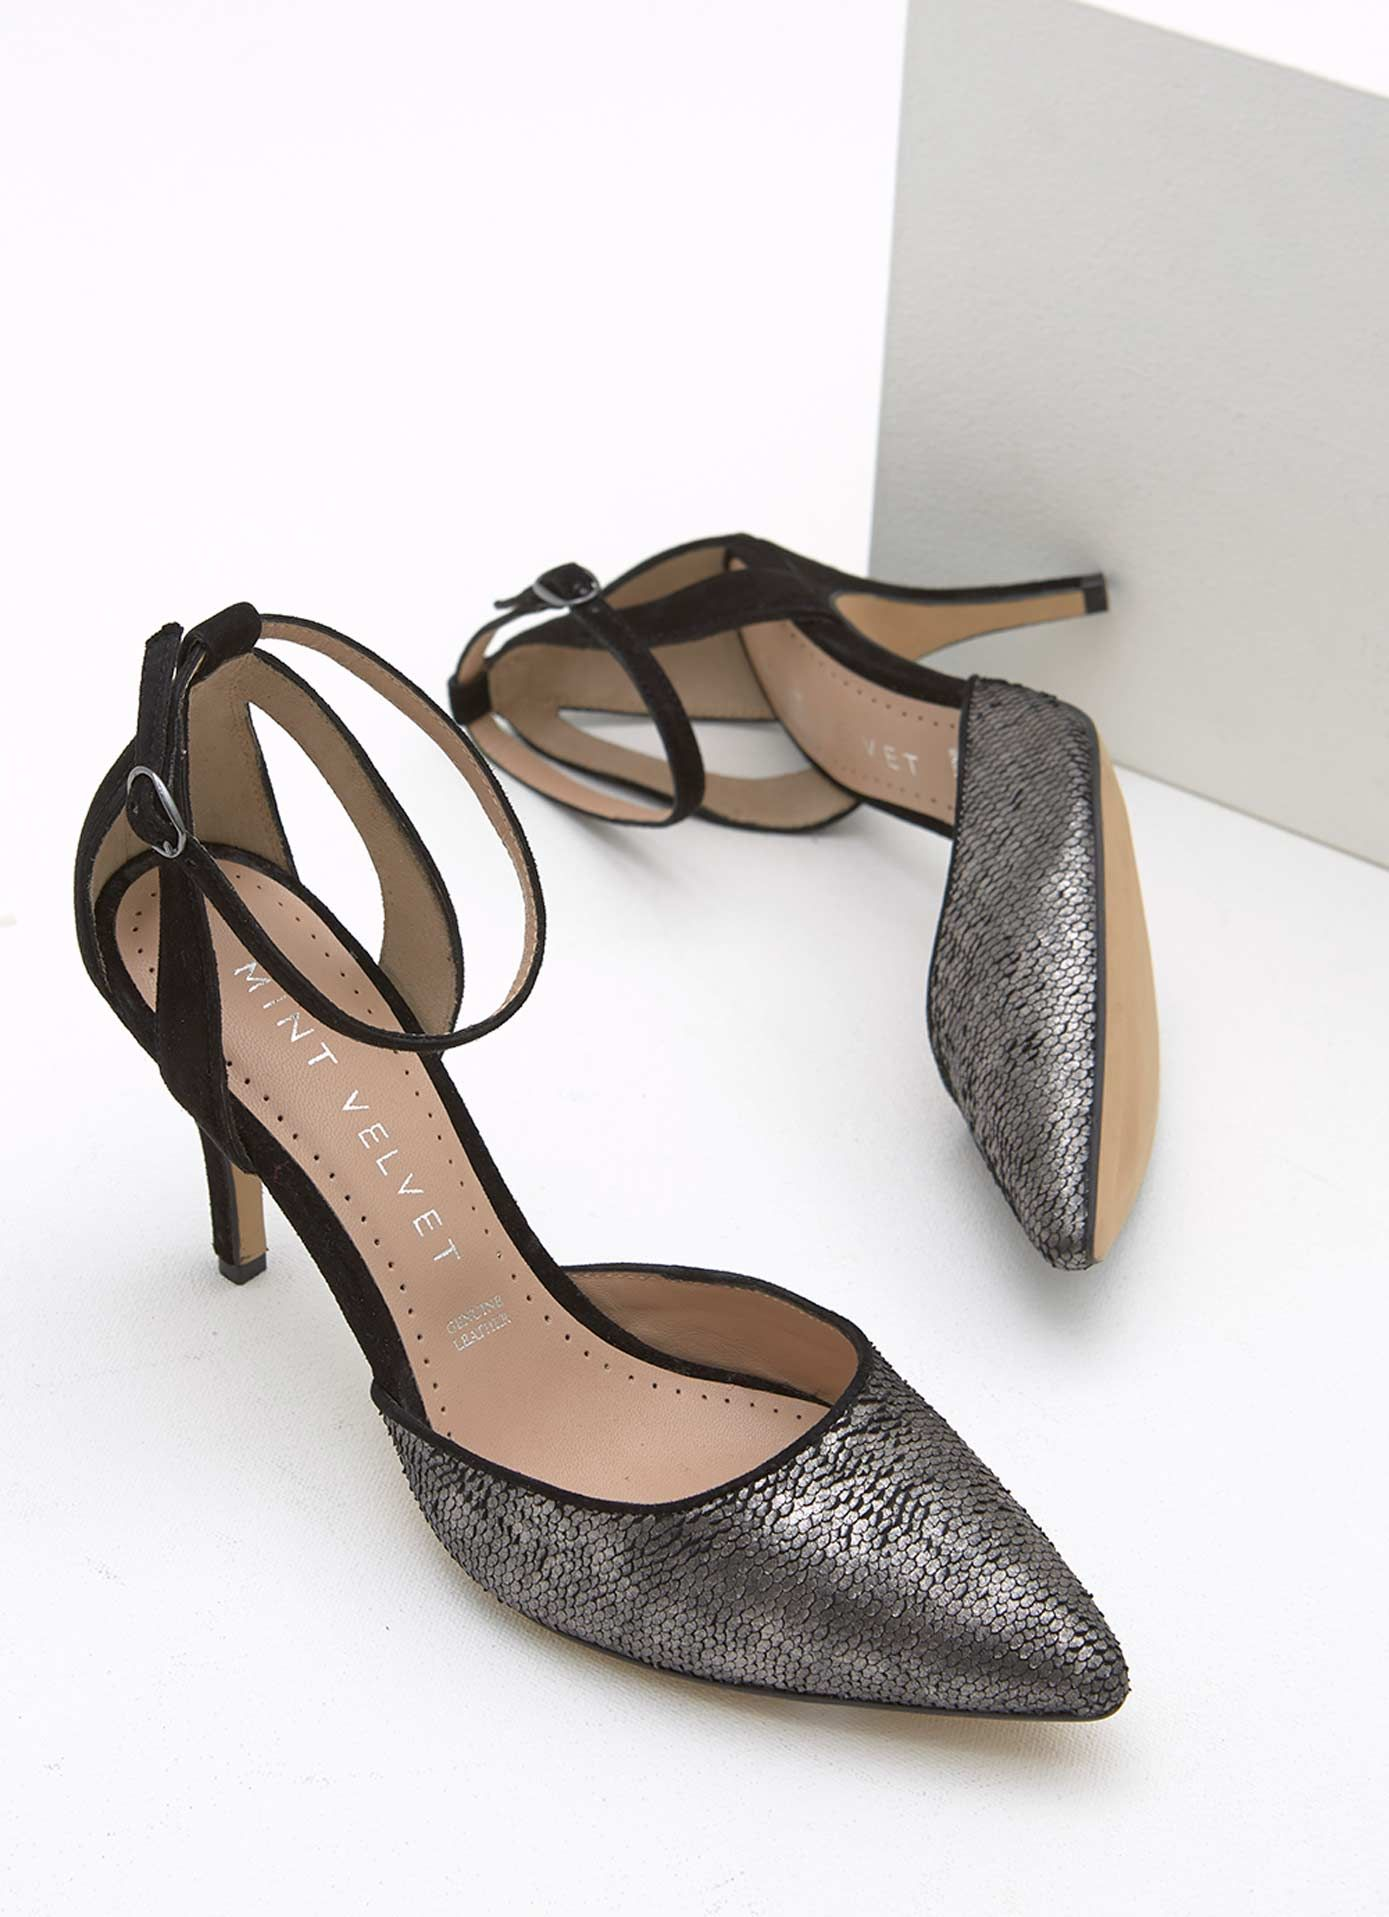 Wide Fit Gold Diamante Heeled Shoes Quiz Clothing Heels Footwear Design Women Shoe Quiz